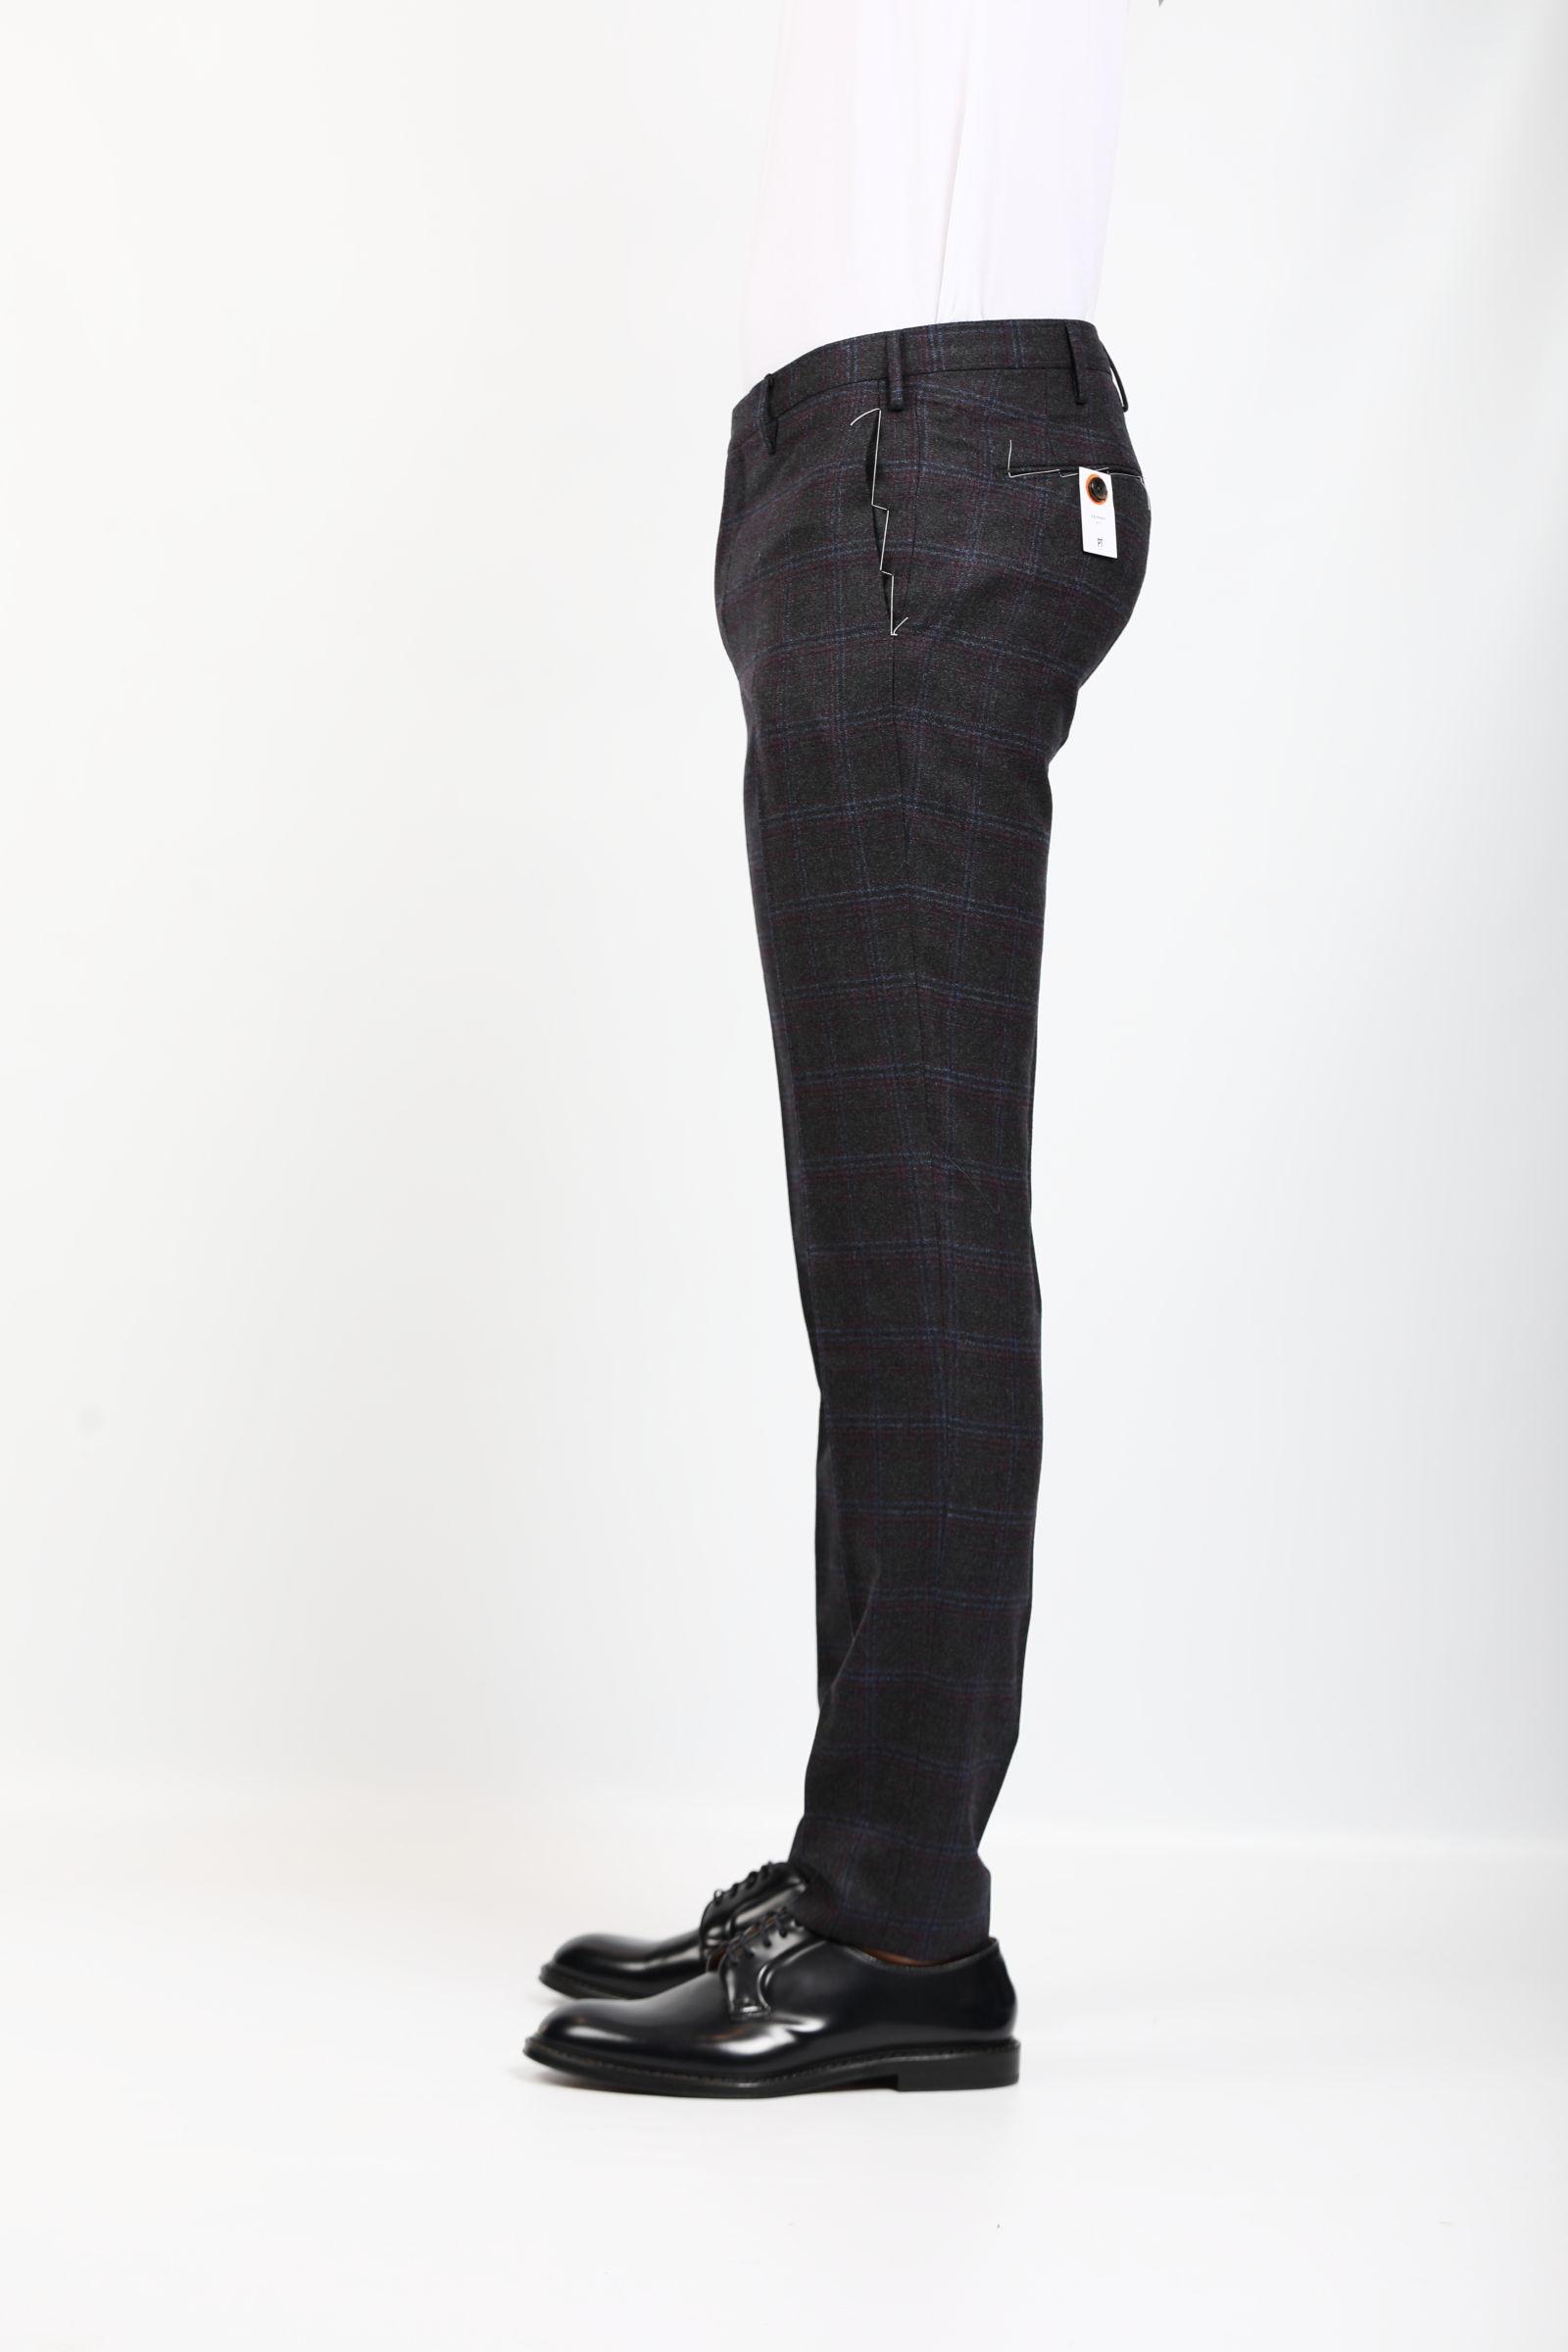 PANTALONE IN LANA PT TORINO   Pantaloni   KFZEZ00CL1-RB010260